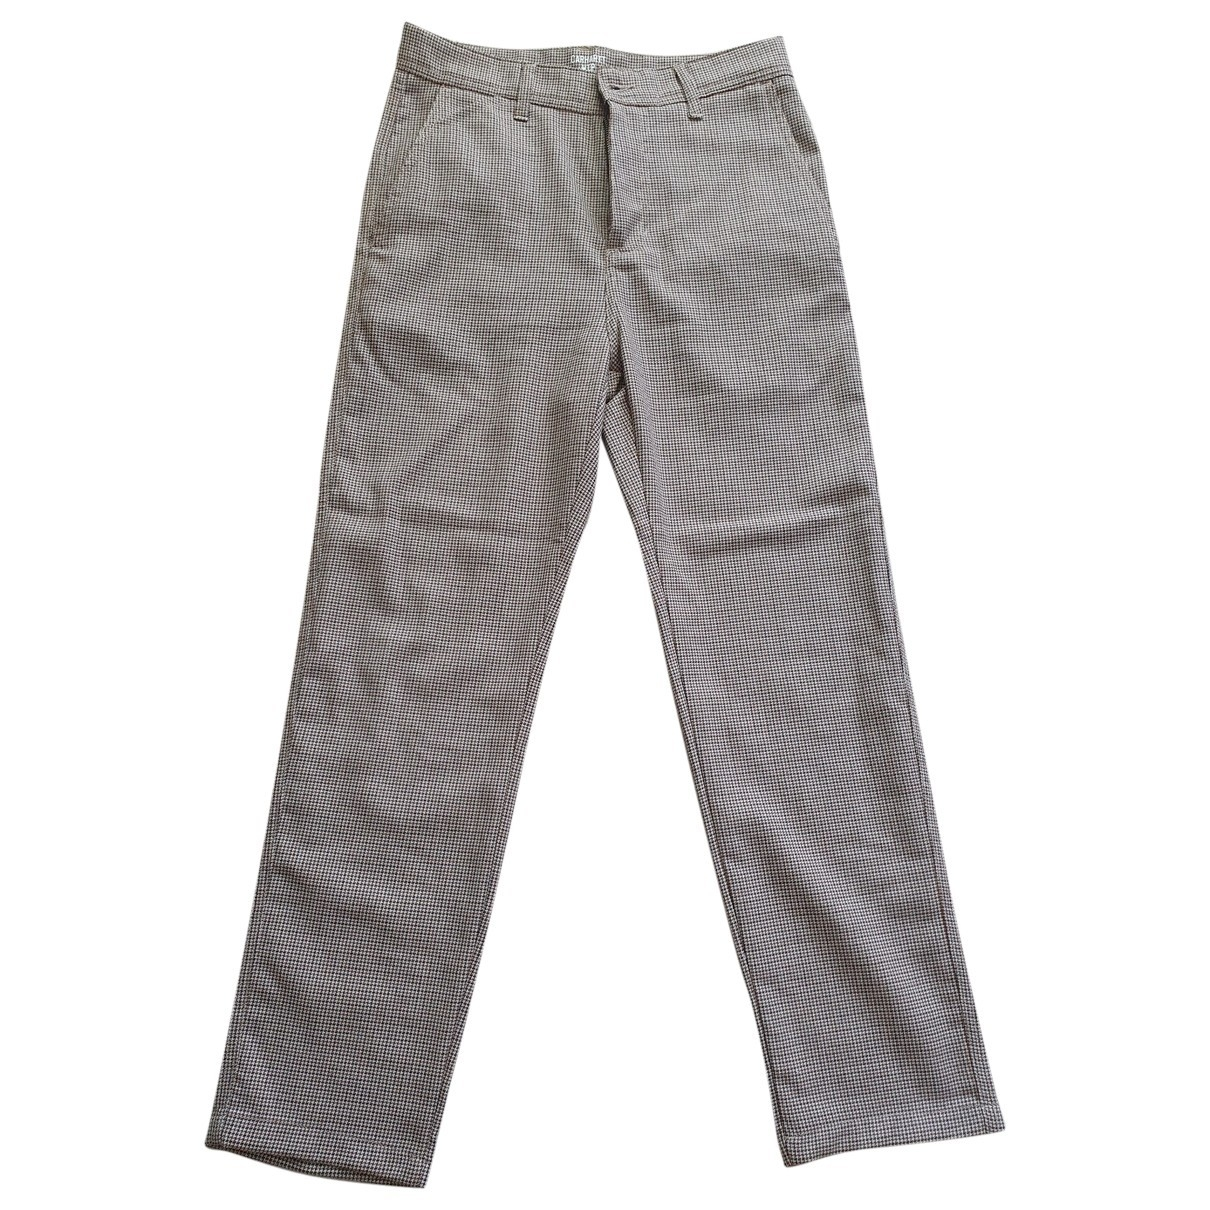 Carhartt \N Brown Wool Trousers for Men 28 UK - US